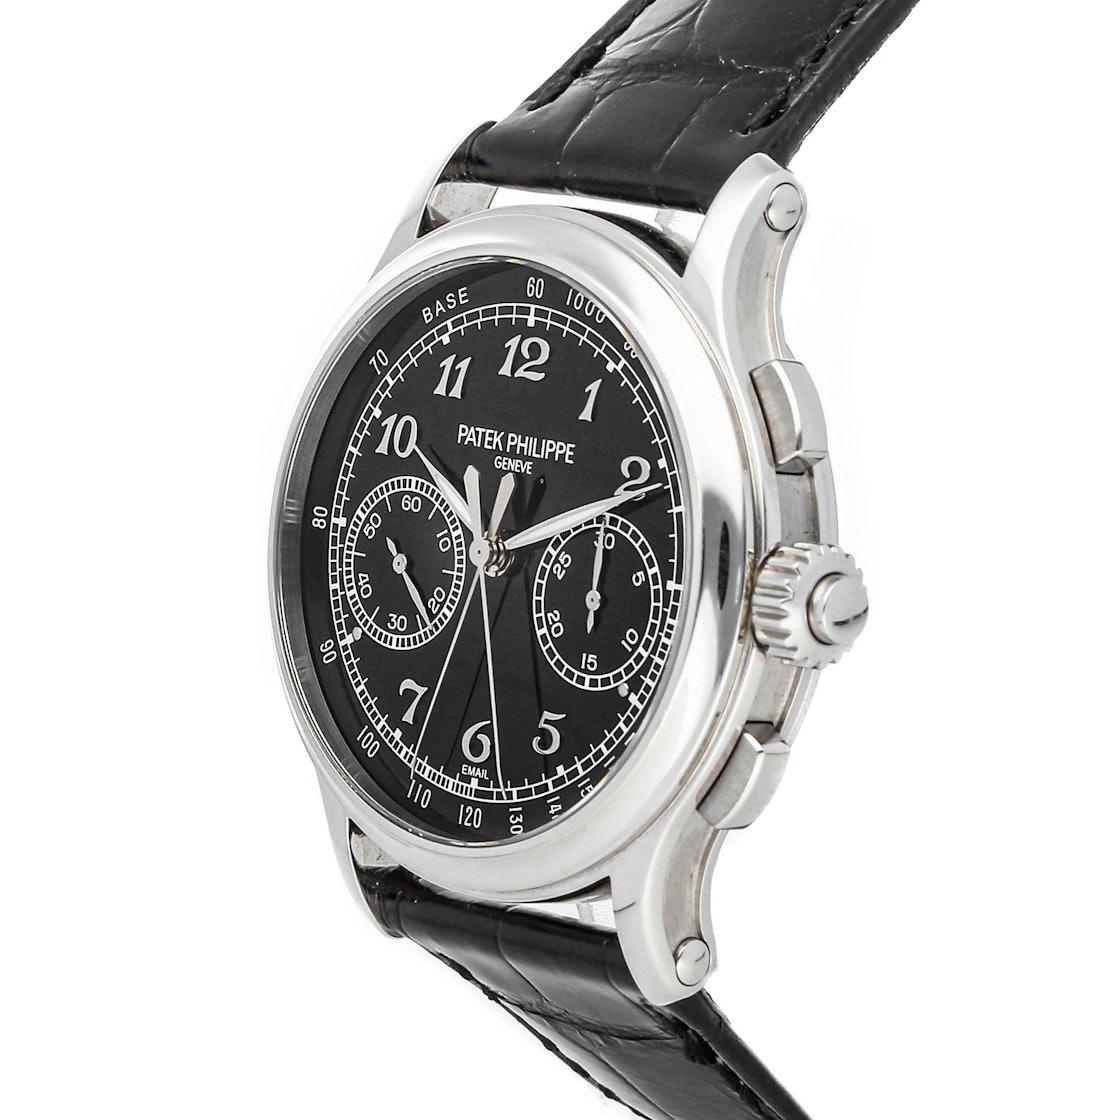 Patek Philippe Grand Complications Split-Seconds Chronograph 5370P-001